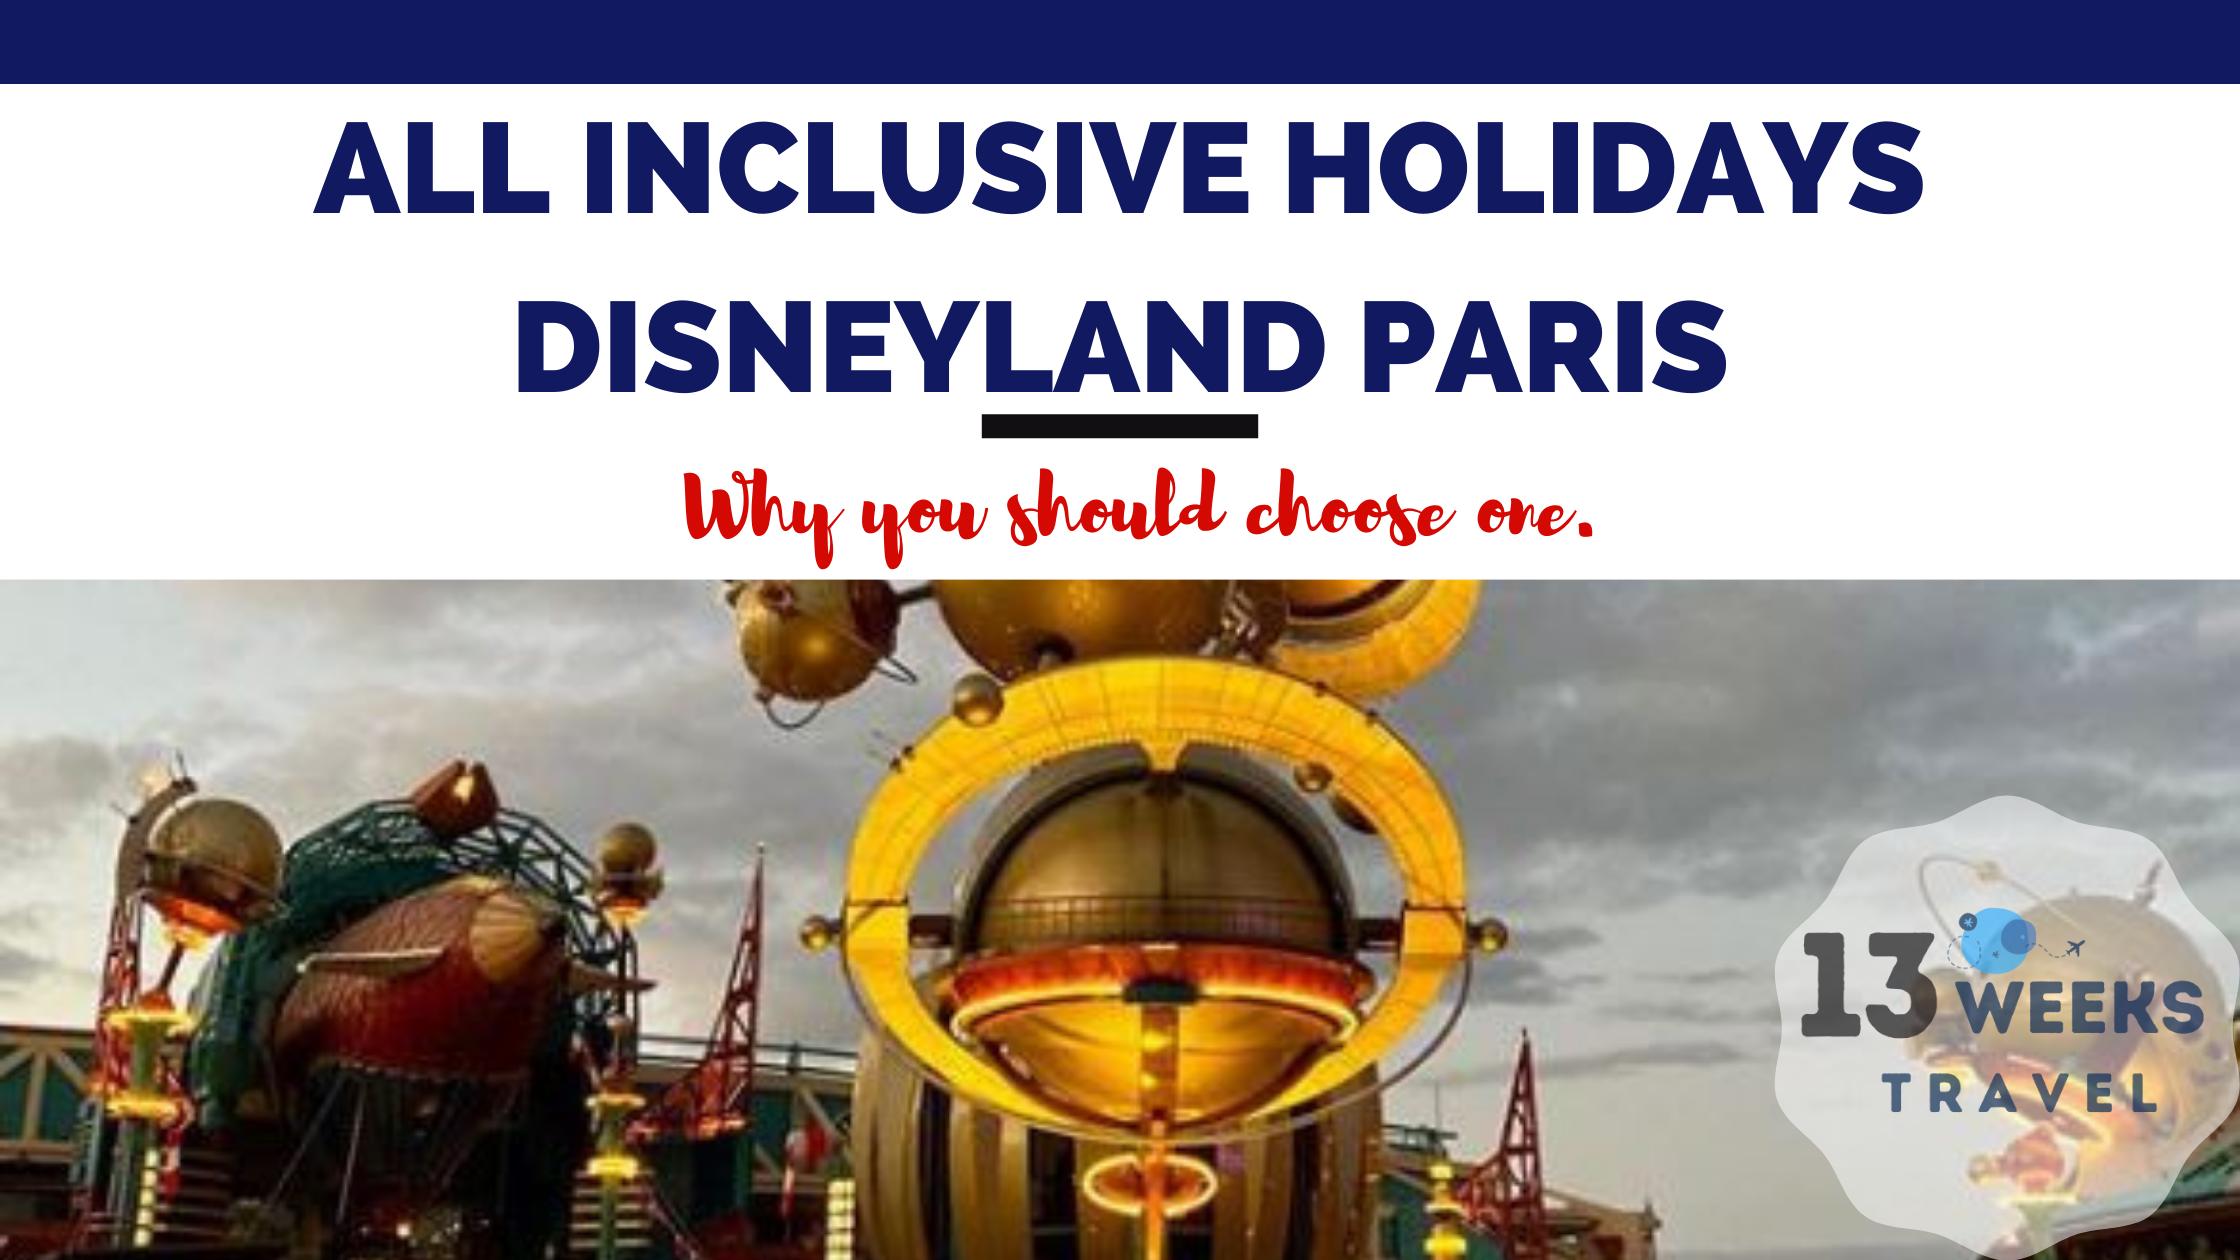 All Inclusive Holidays Disneyland Paris